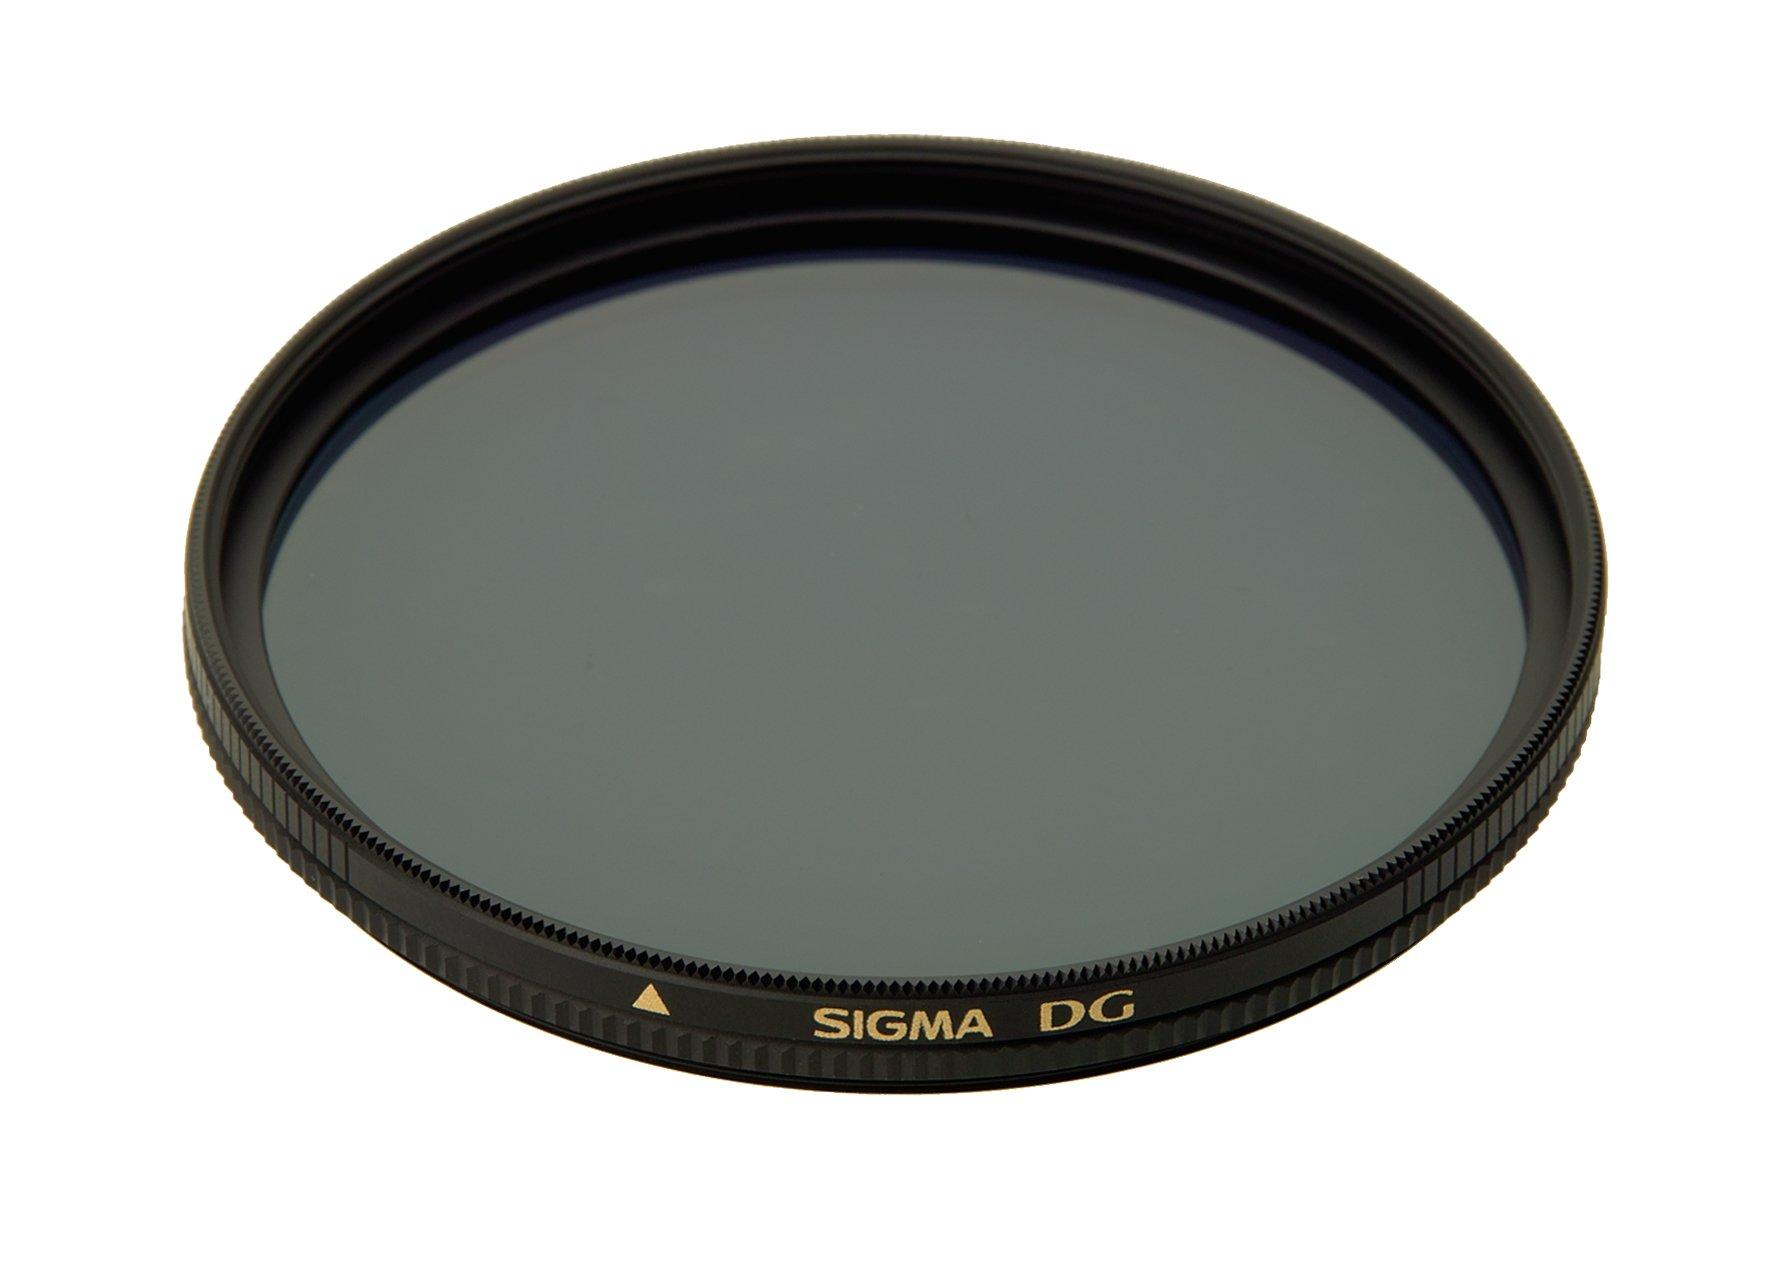 Sigma AFL-950 46mm EX DG Circular Polarizer Filter by Sigma